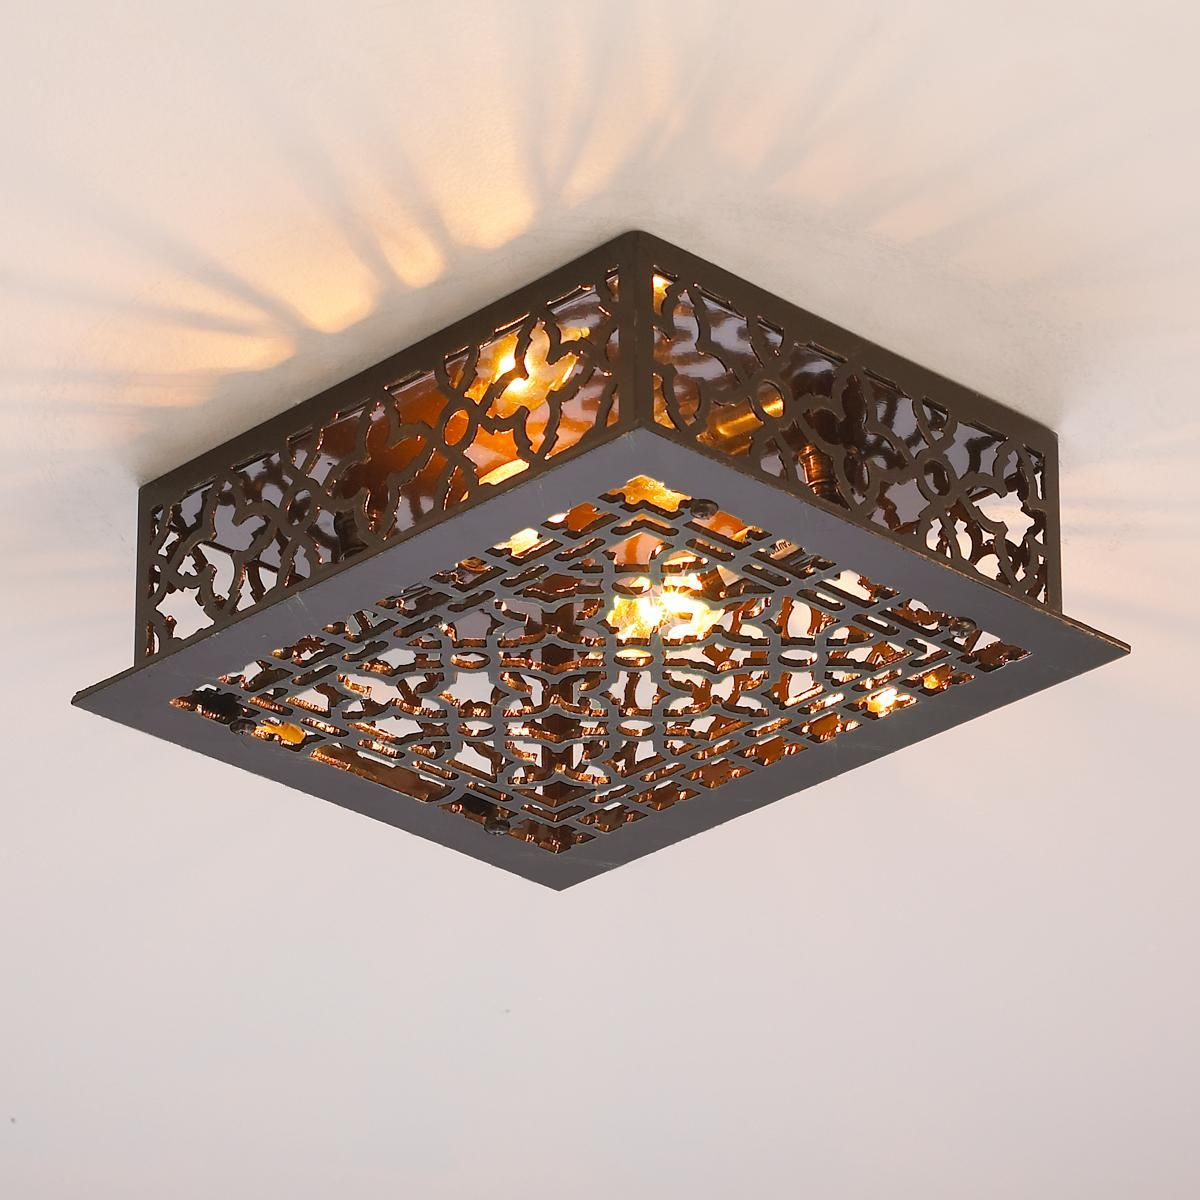 Reproduction Iron Grate Flush Mount Ceiling Light